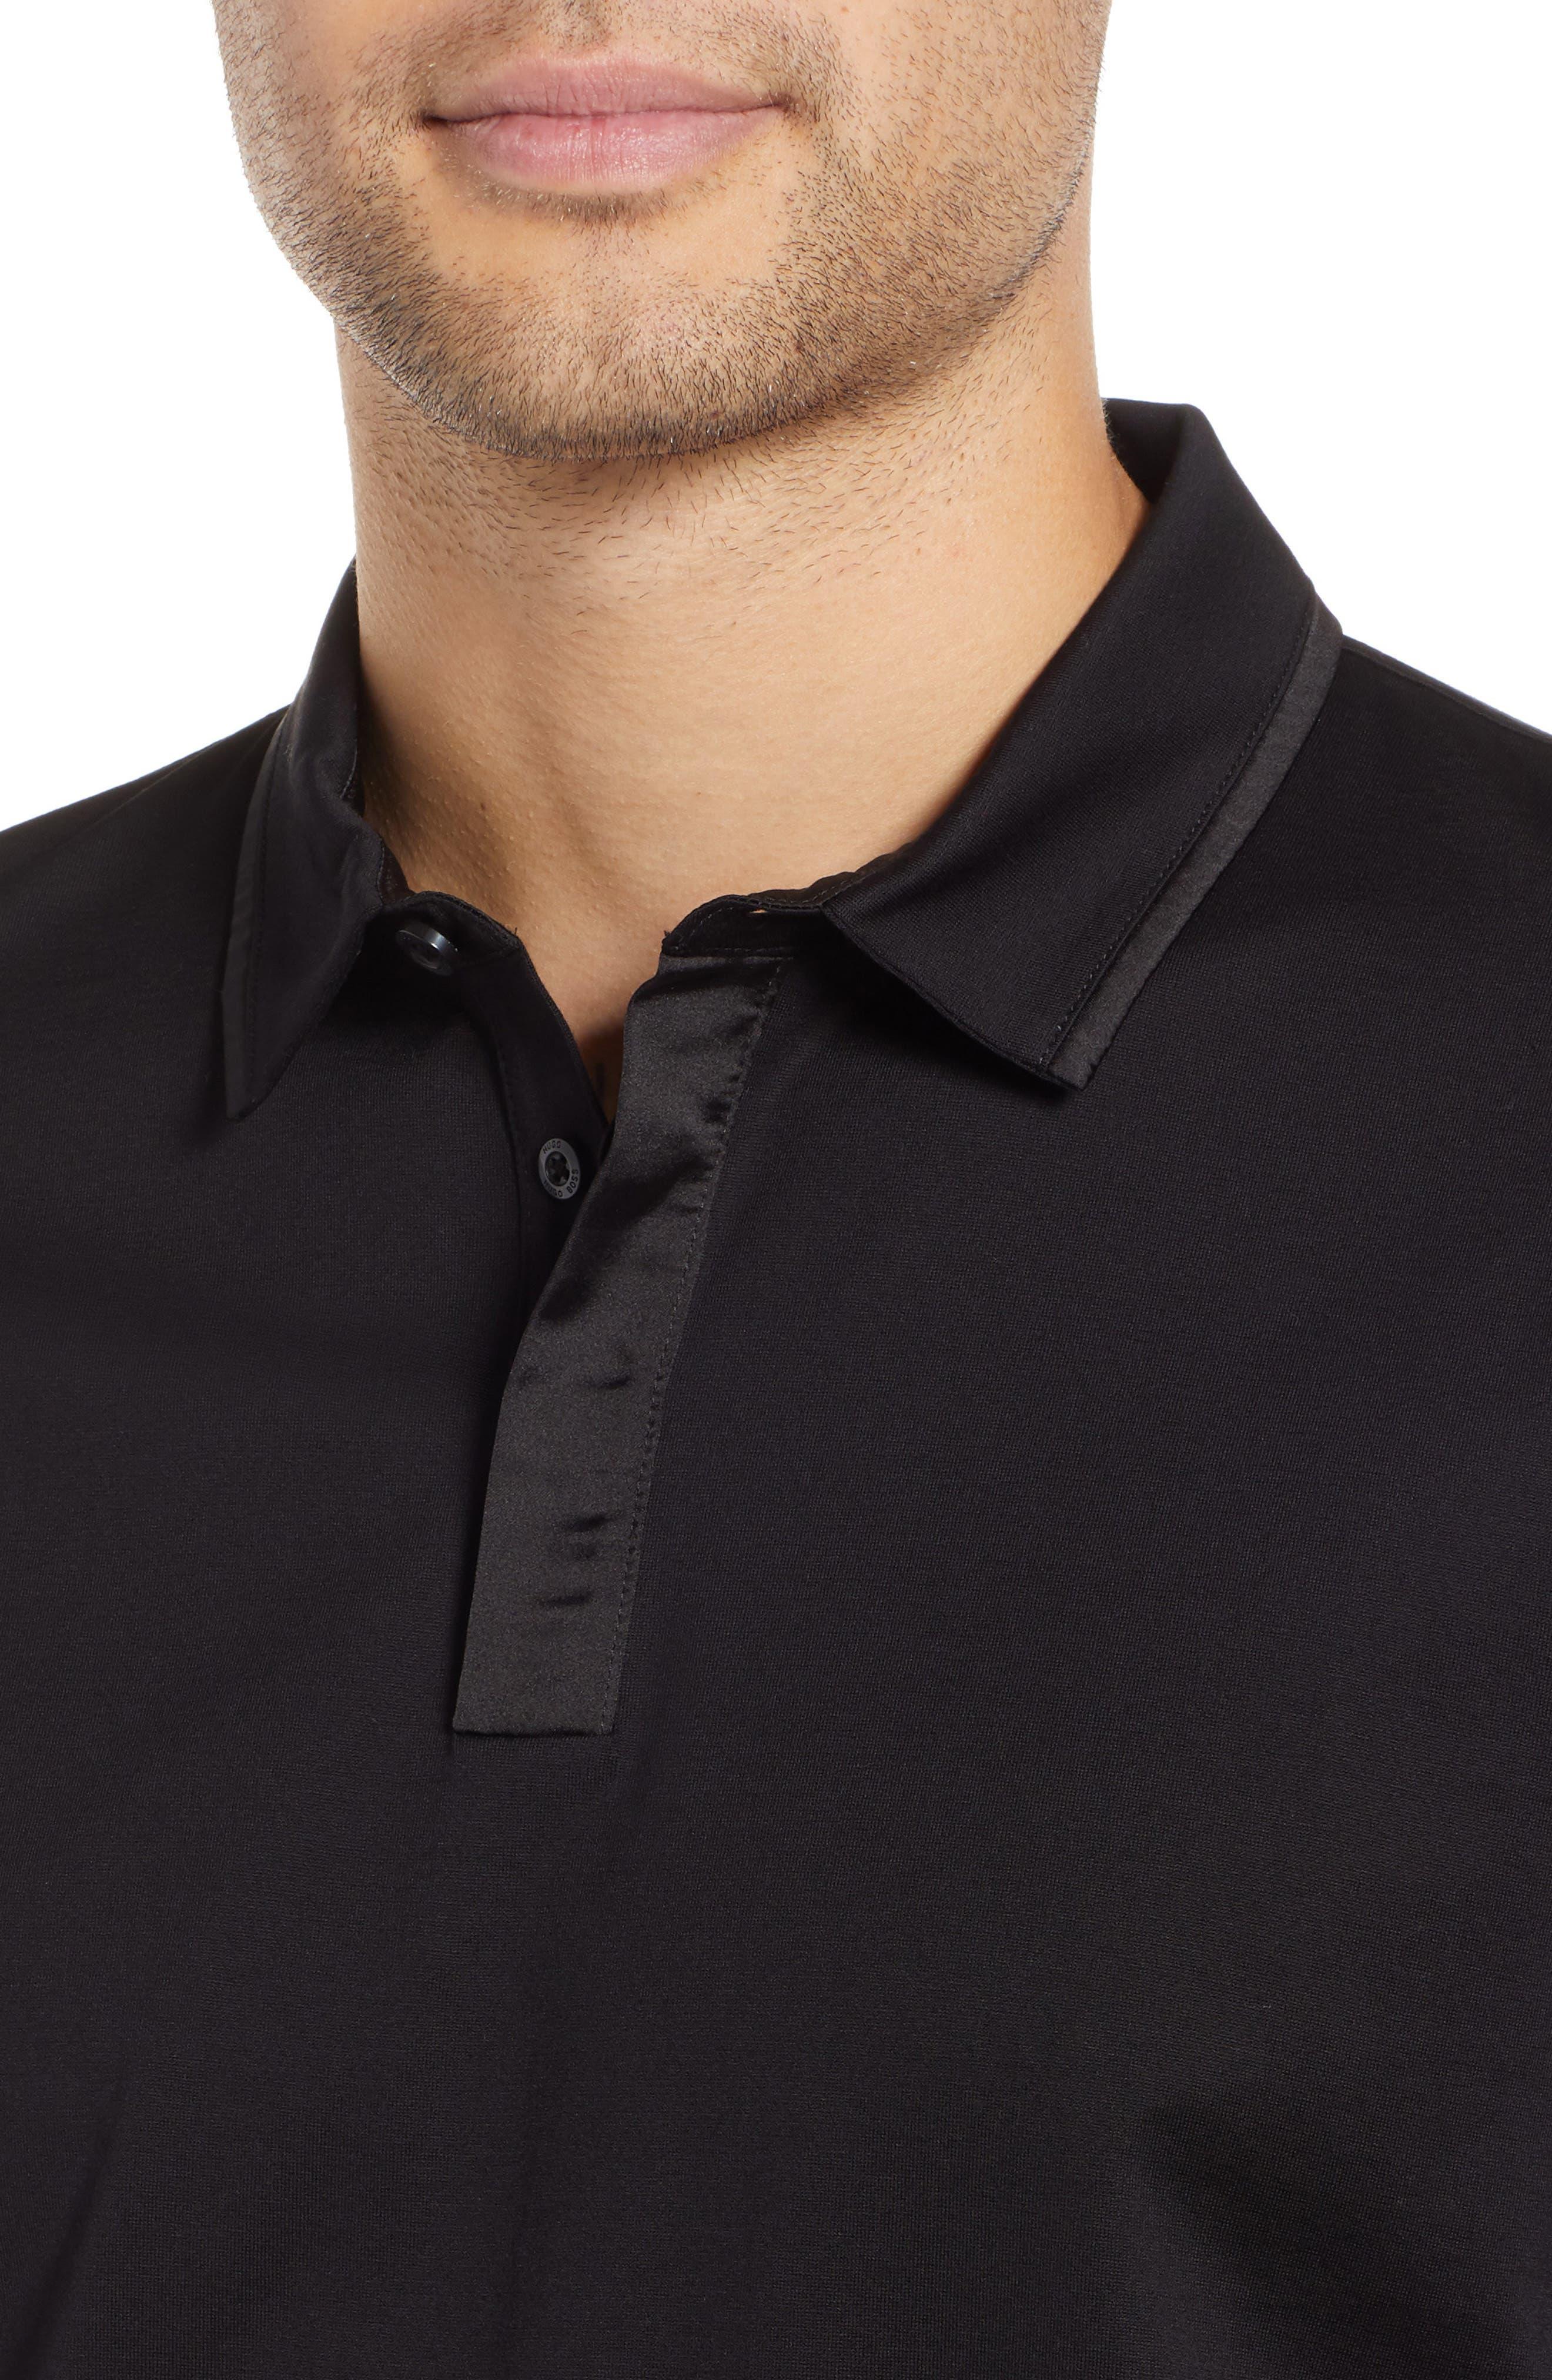 Dalendar Mercerized Cotton Slim Fit Polo Shirt,                             Alternate thumbnail 4, color,                             BLACK